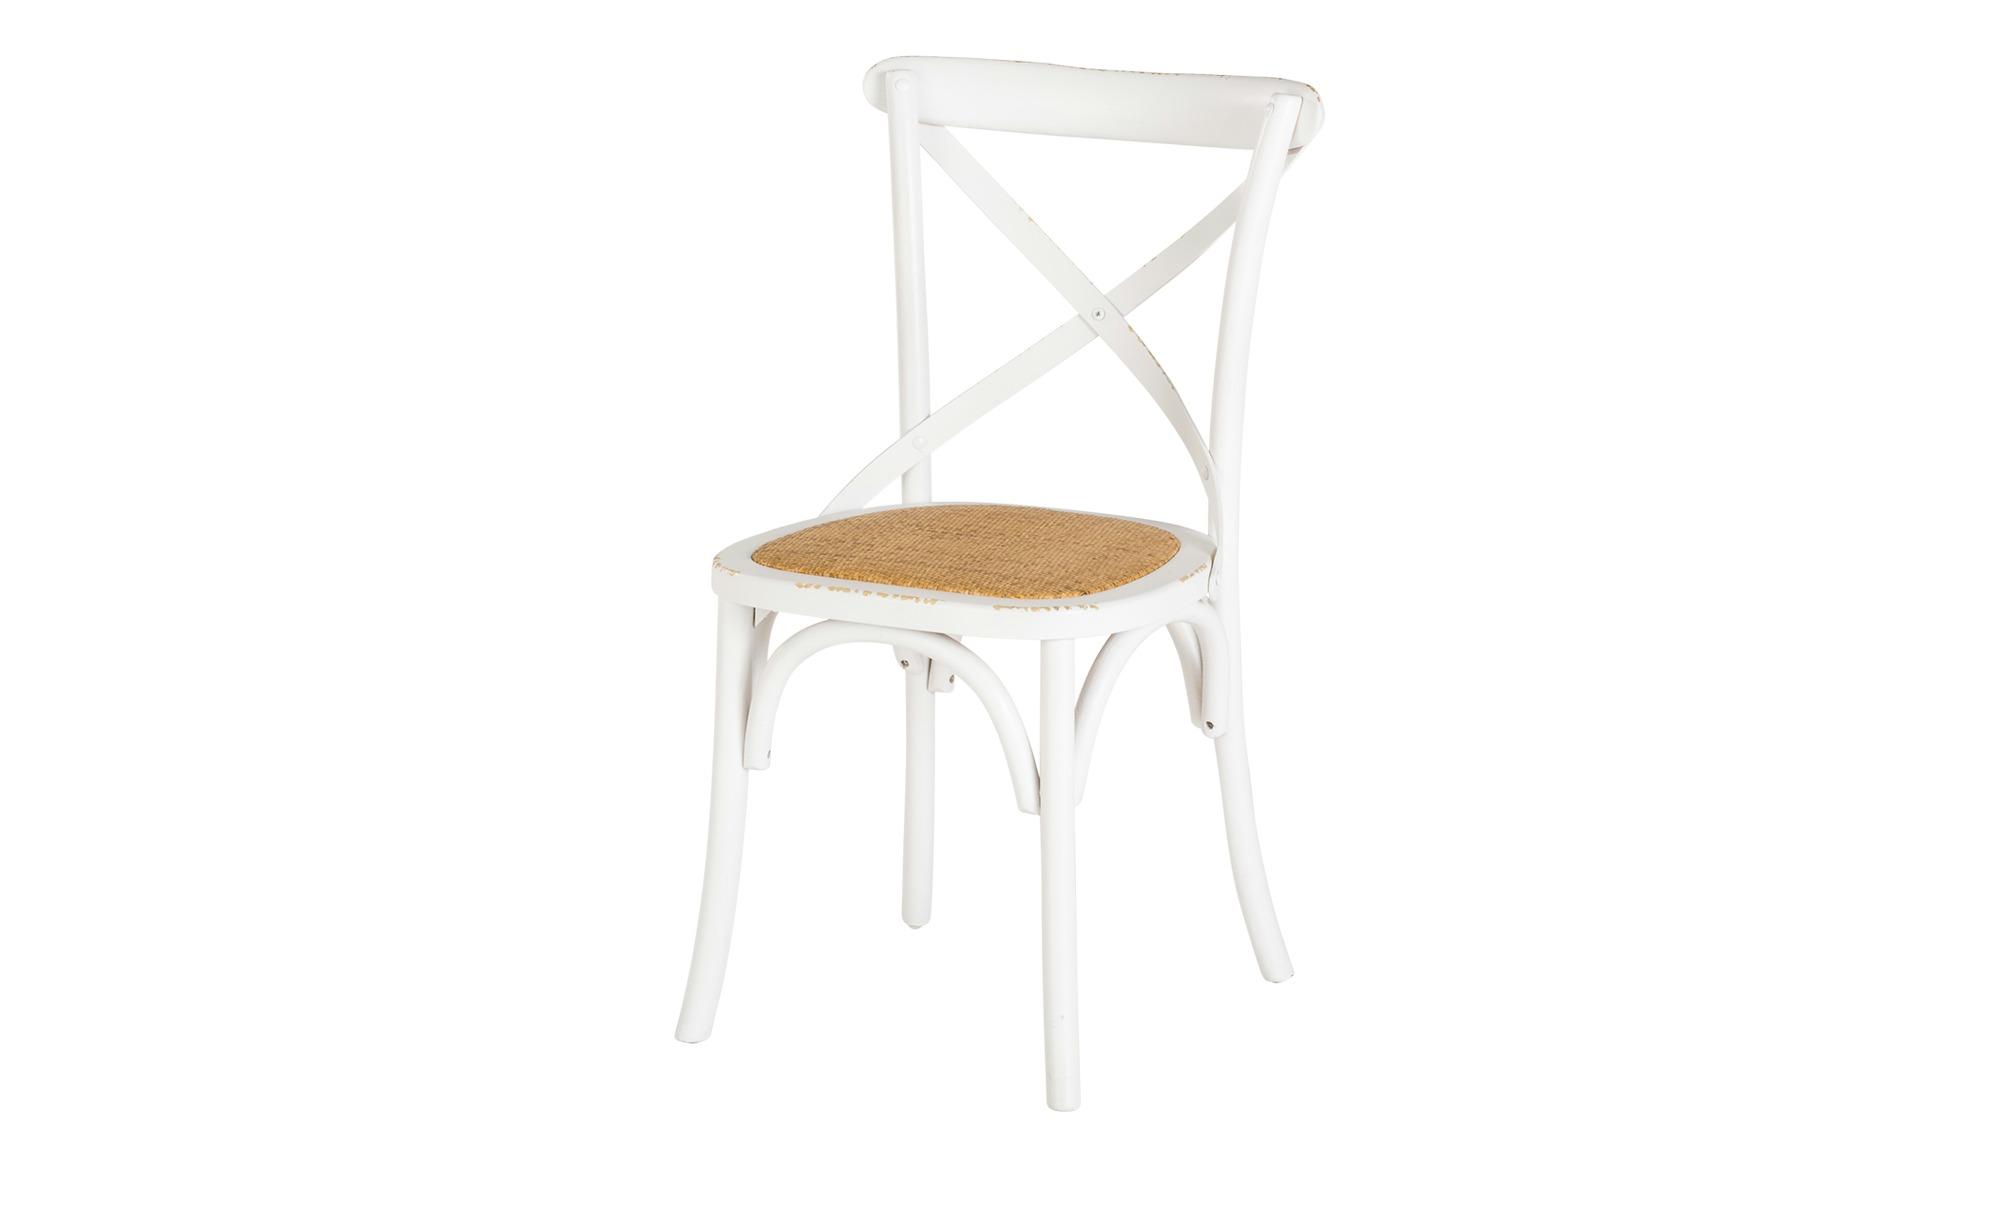 Holz Stuhl Im Used Look Weiss Bei Mobel Kraft Online Kaufen